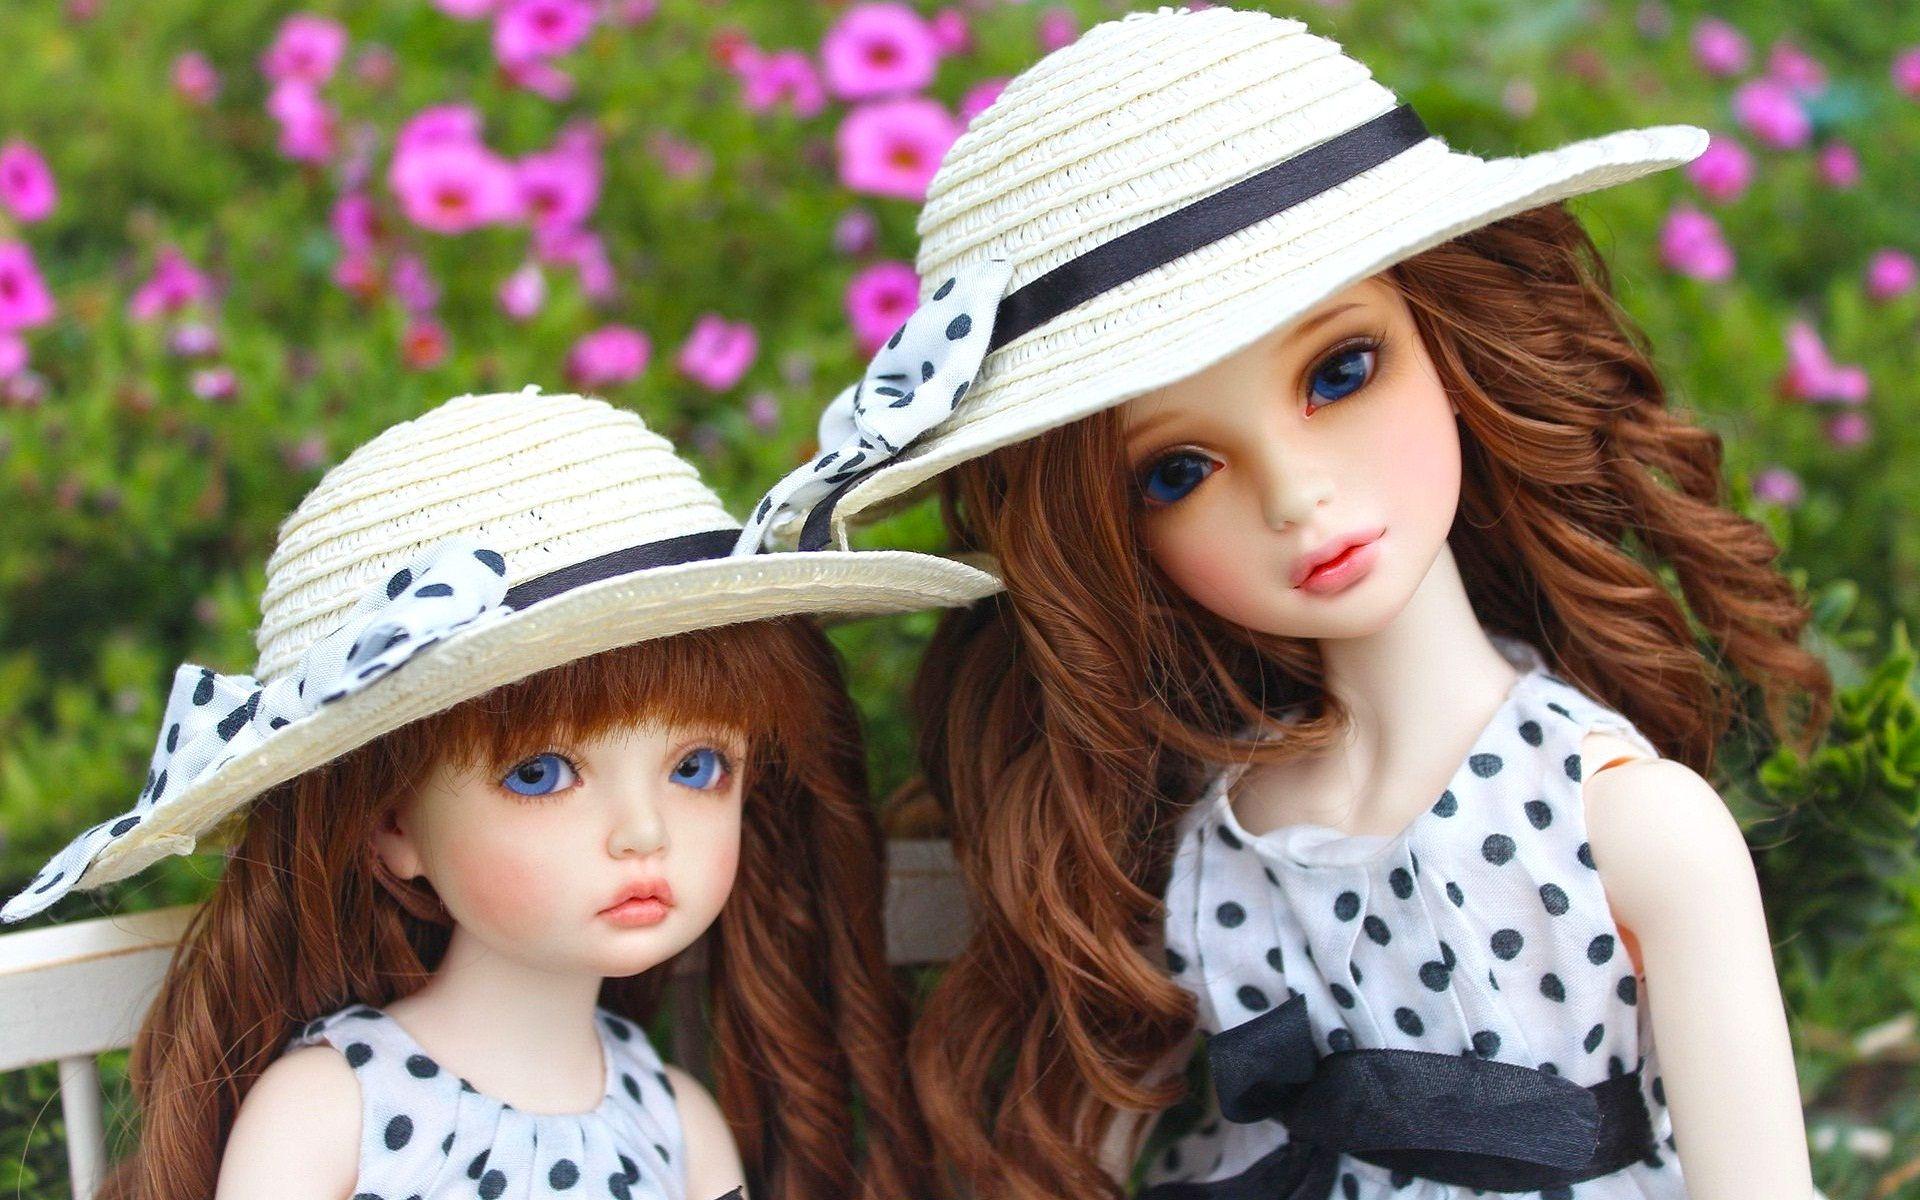 Cute barbie doll sad hd wallpaper dolls pinterest - Cute barbie pic download ...